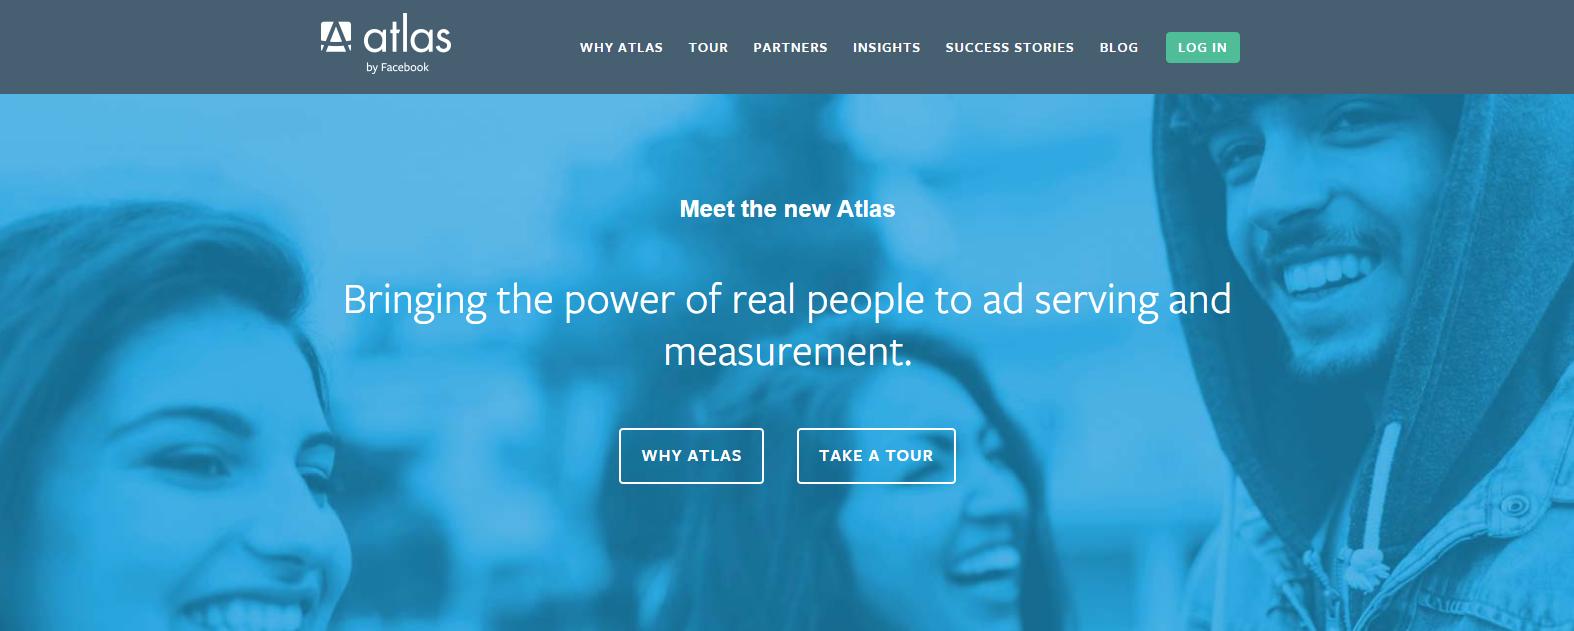 Facebook Atlas Launch Threatens Google's Online Ad Space